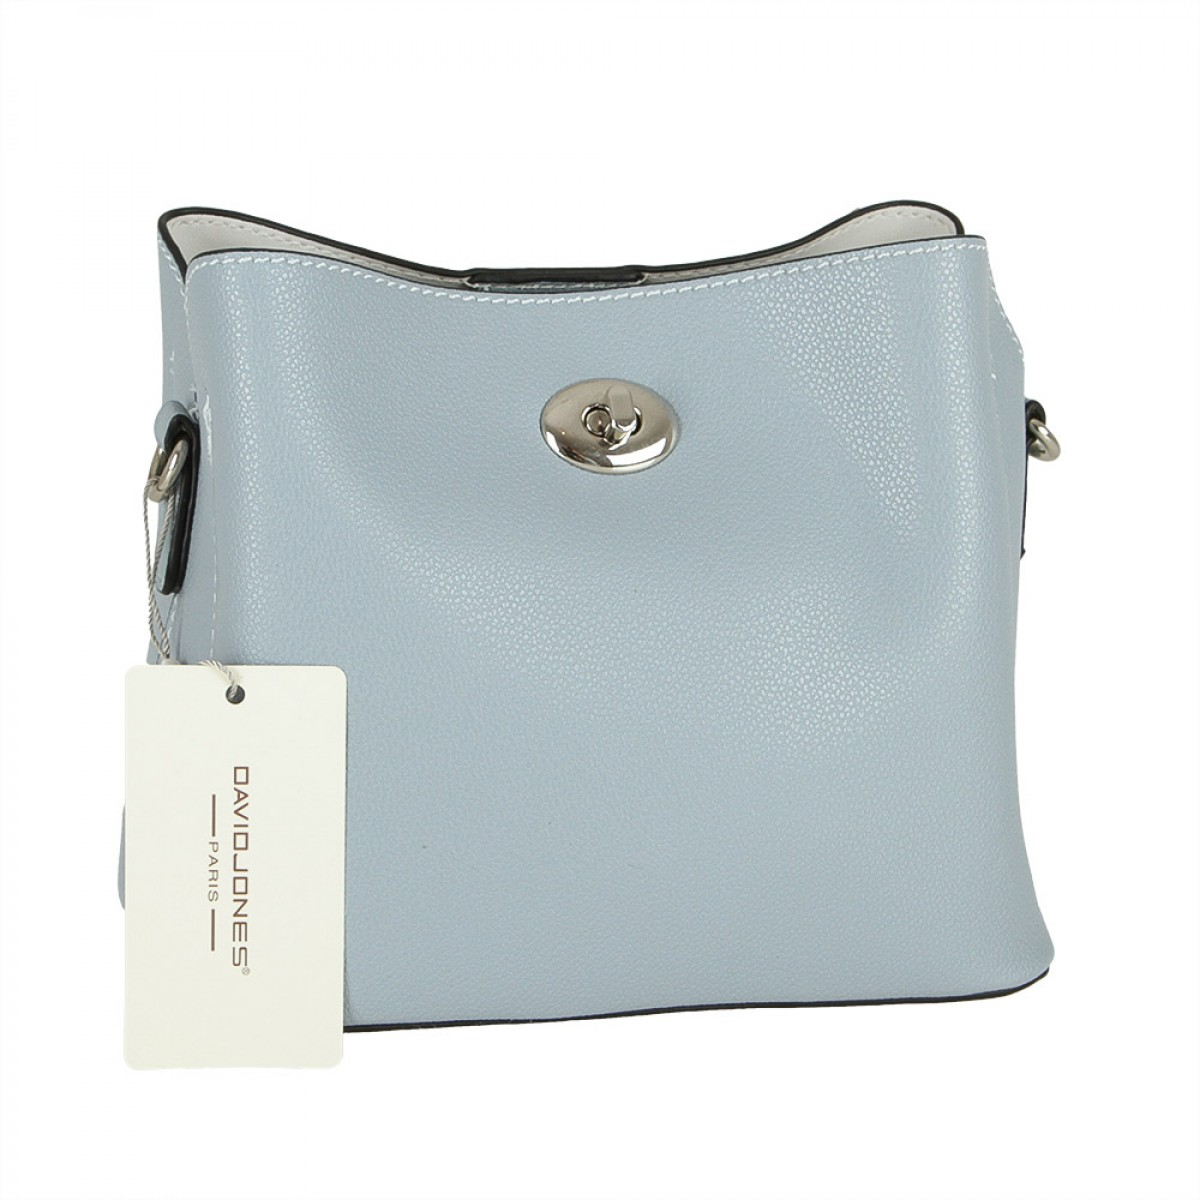 Жіноча сумка David Jones CM5137 PALE BLUE